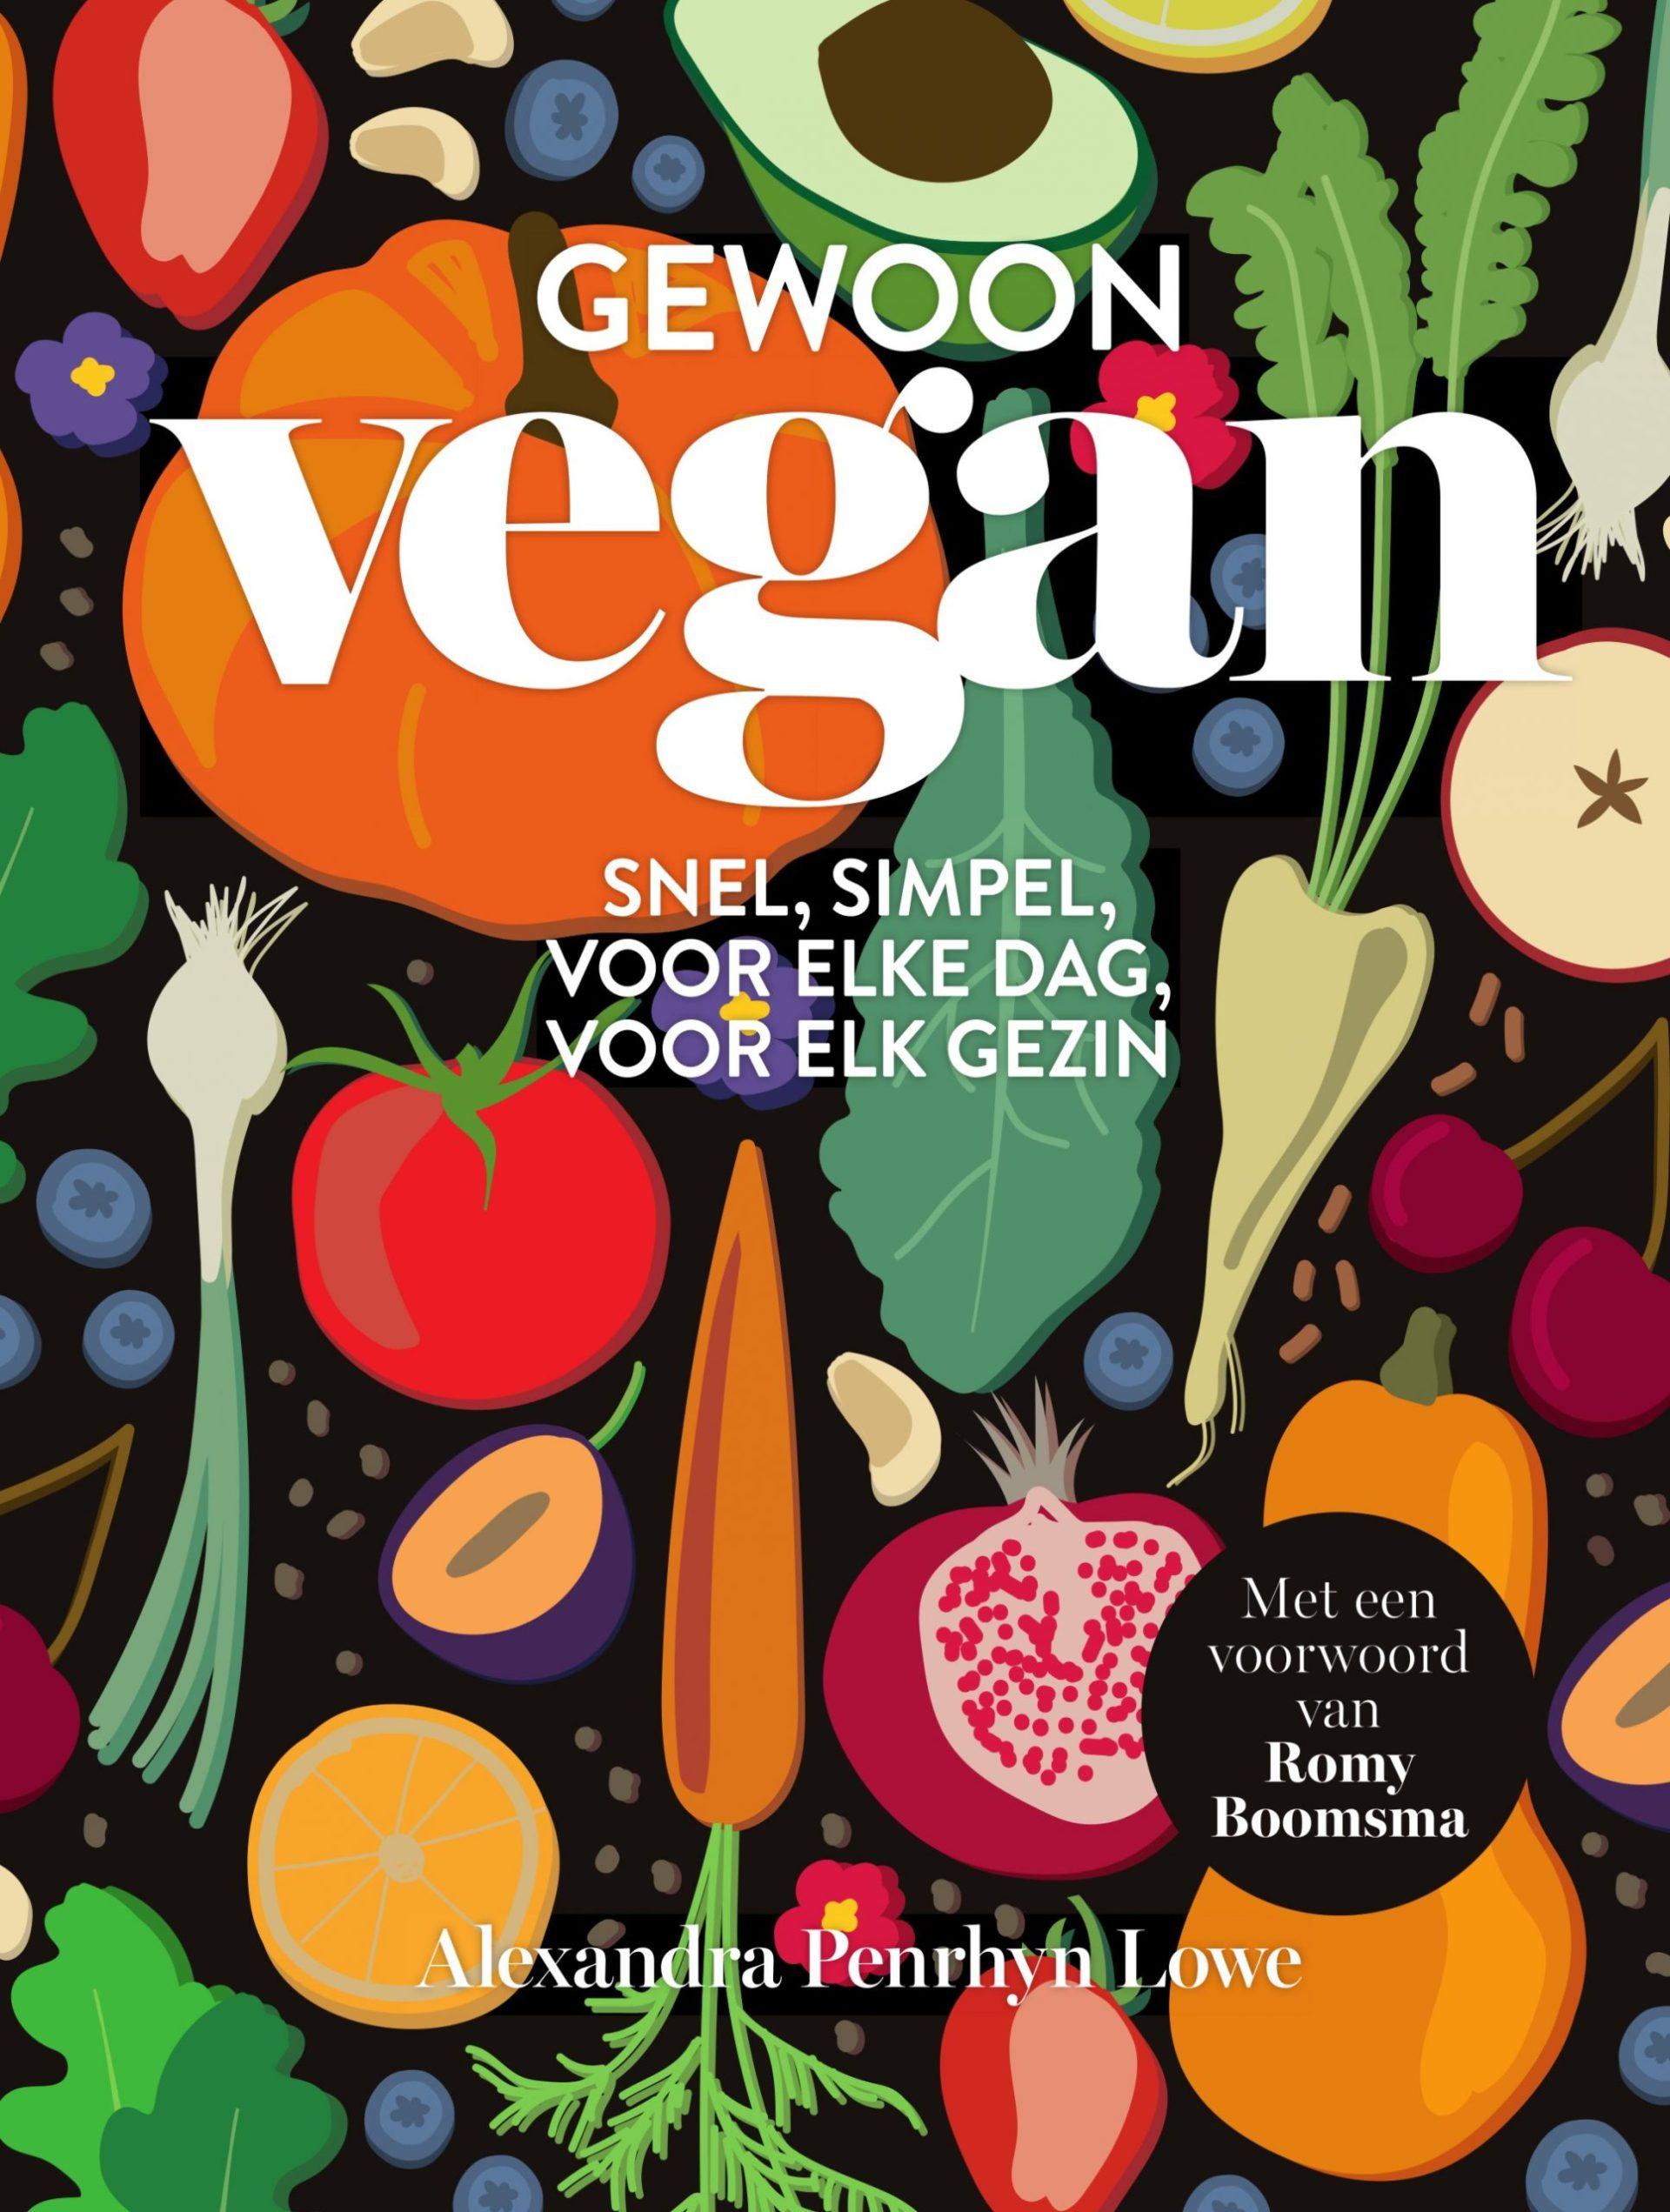 Gewoon Vegan kookboek kaft